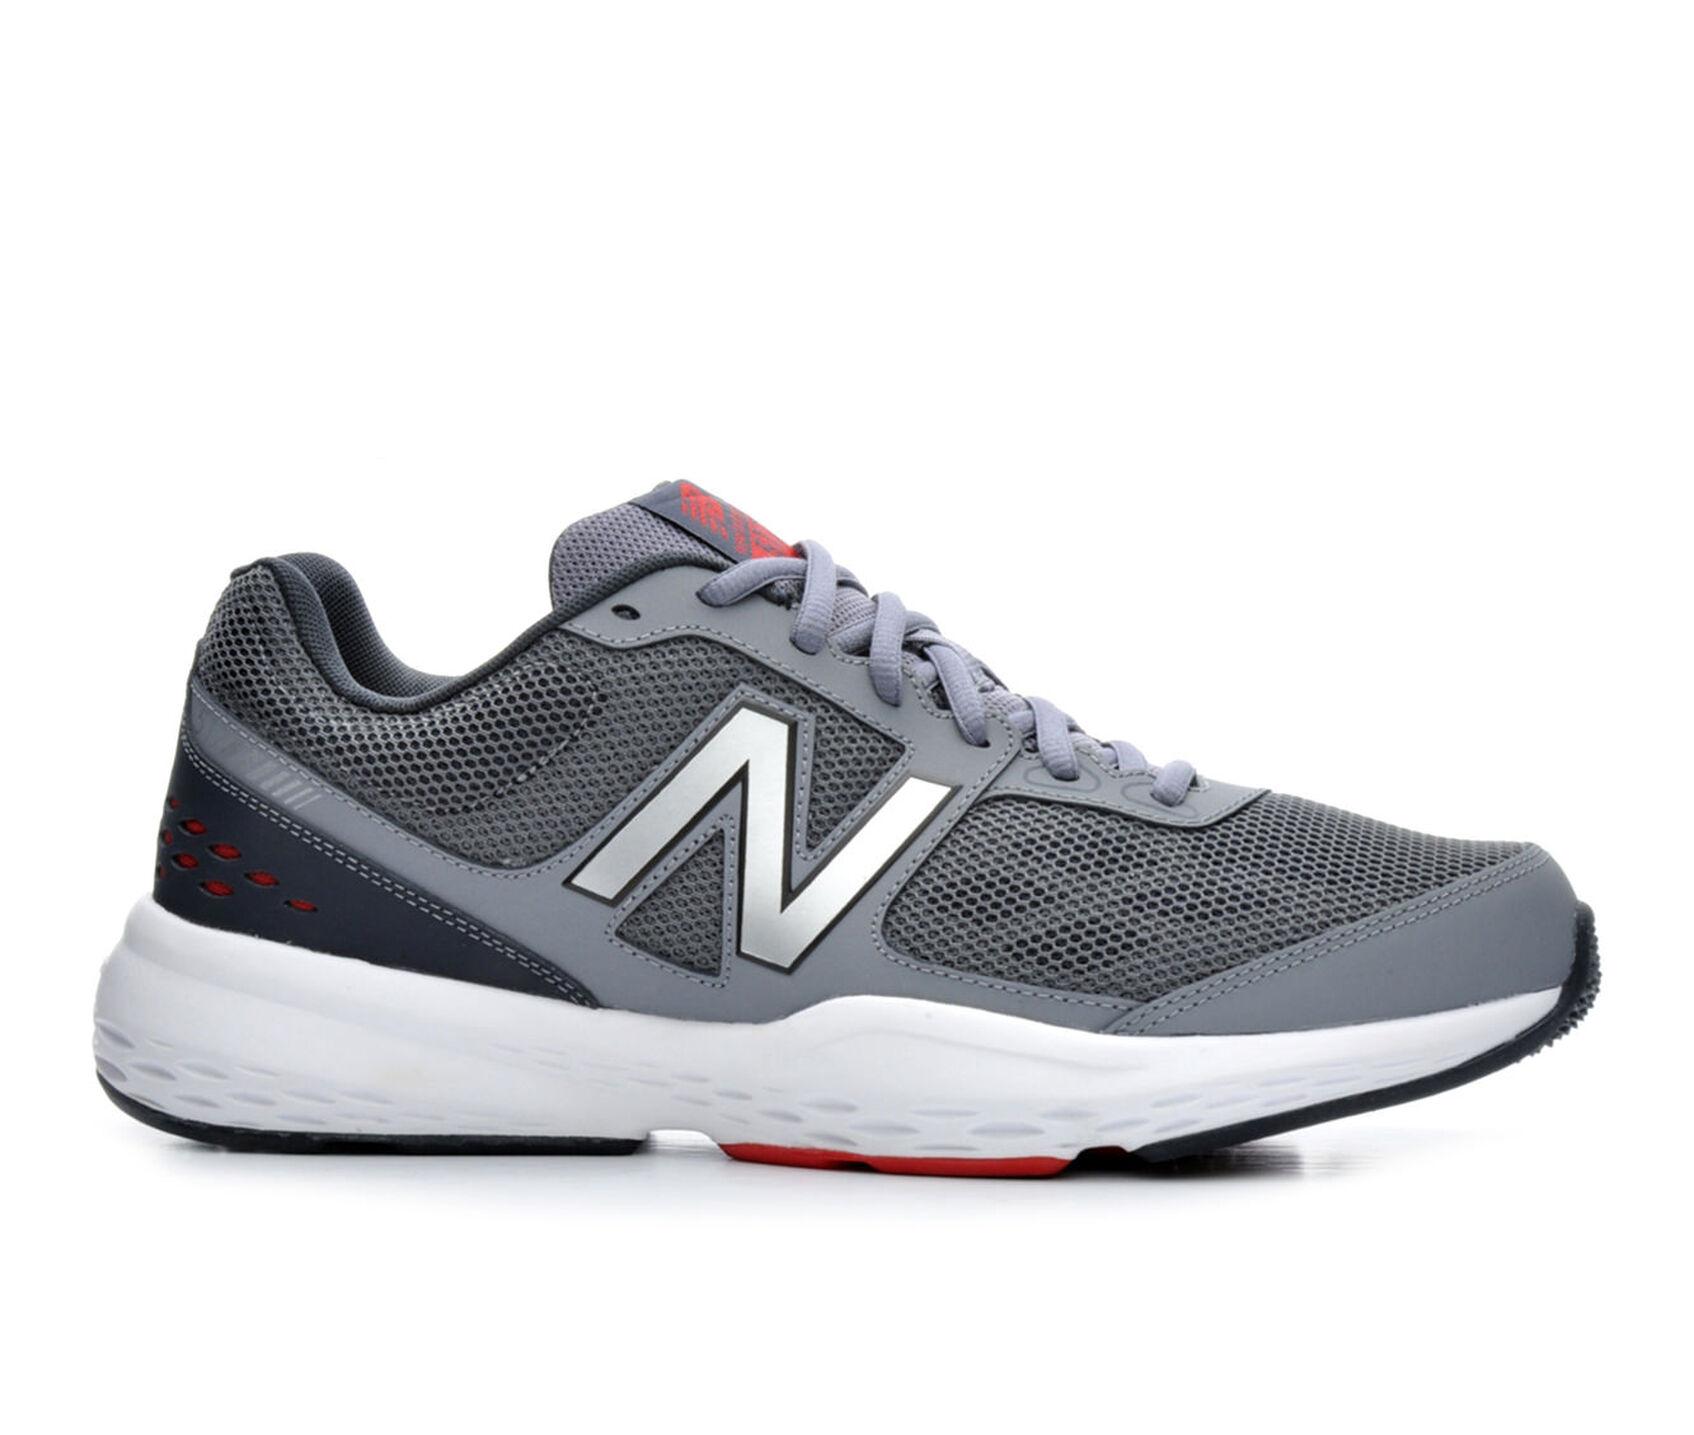 c5ffc626a4 Men's New Balance MX517 Training Shoes